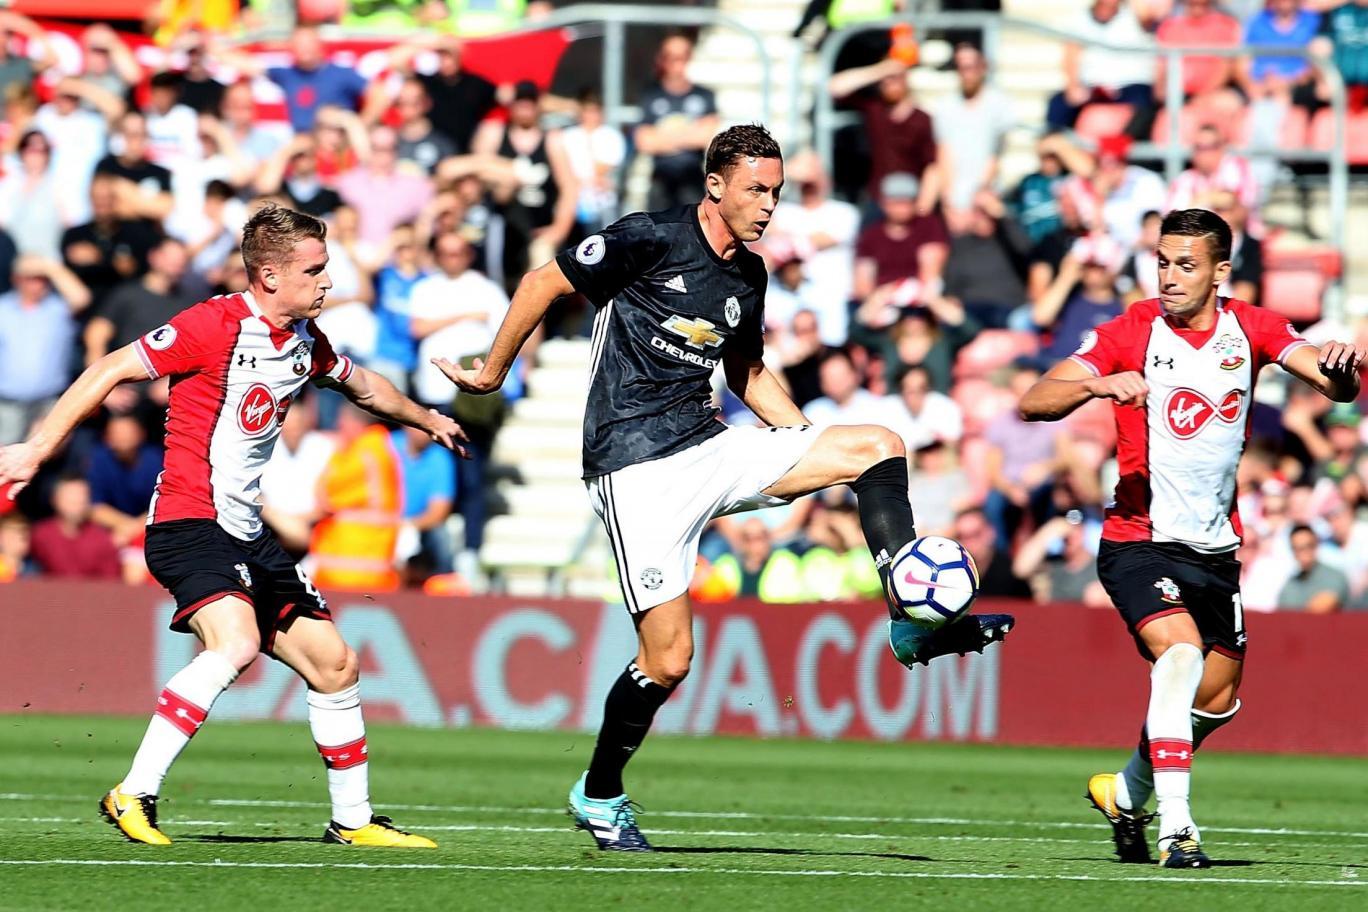 Southampton vs Manchester United